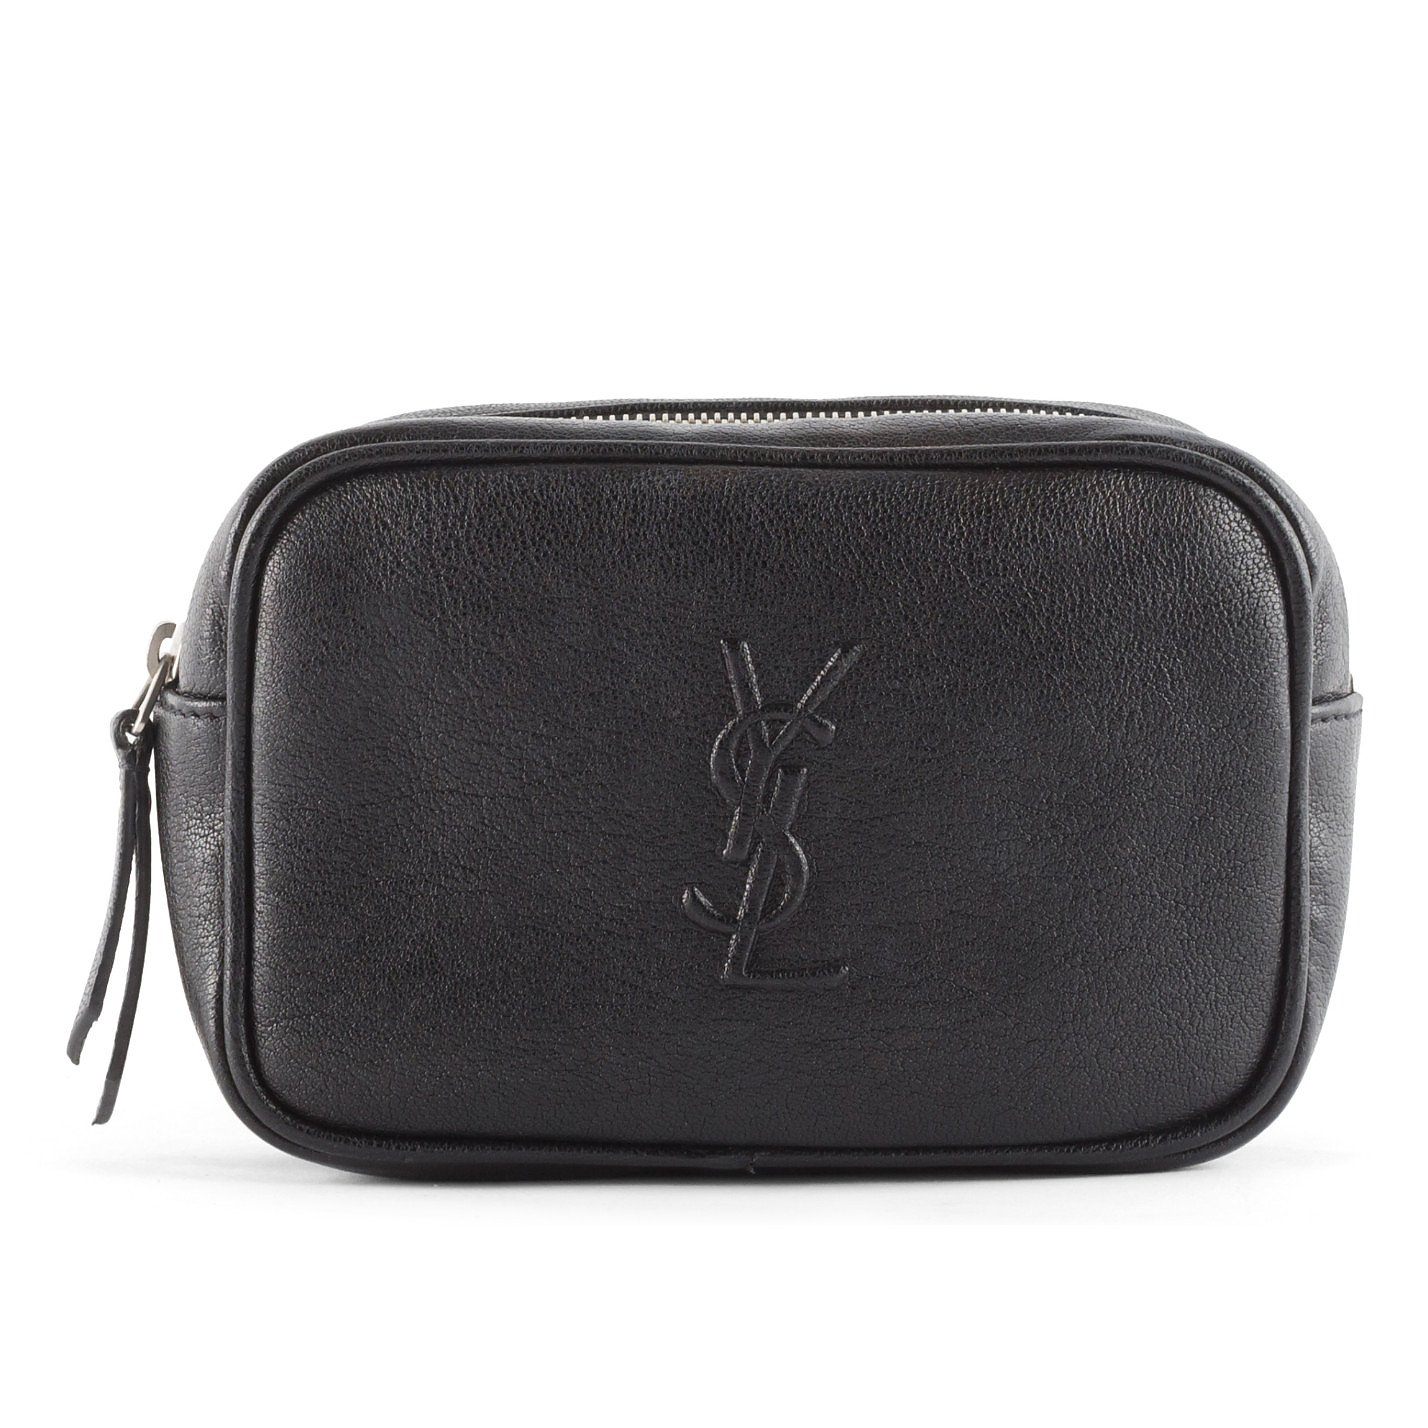 Yves Saint Laurent Lou Belt Bag